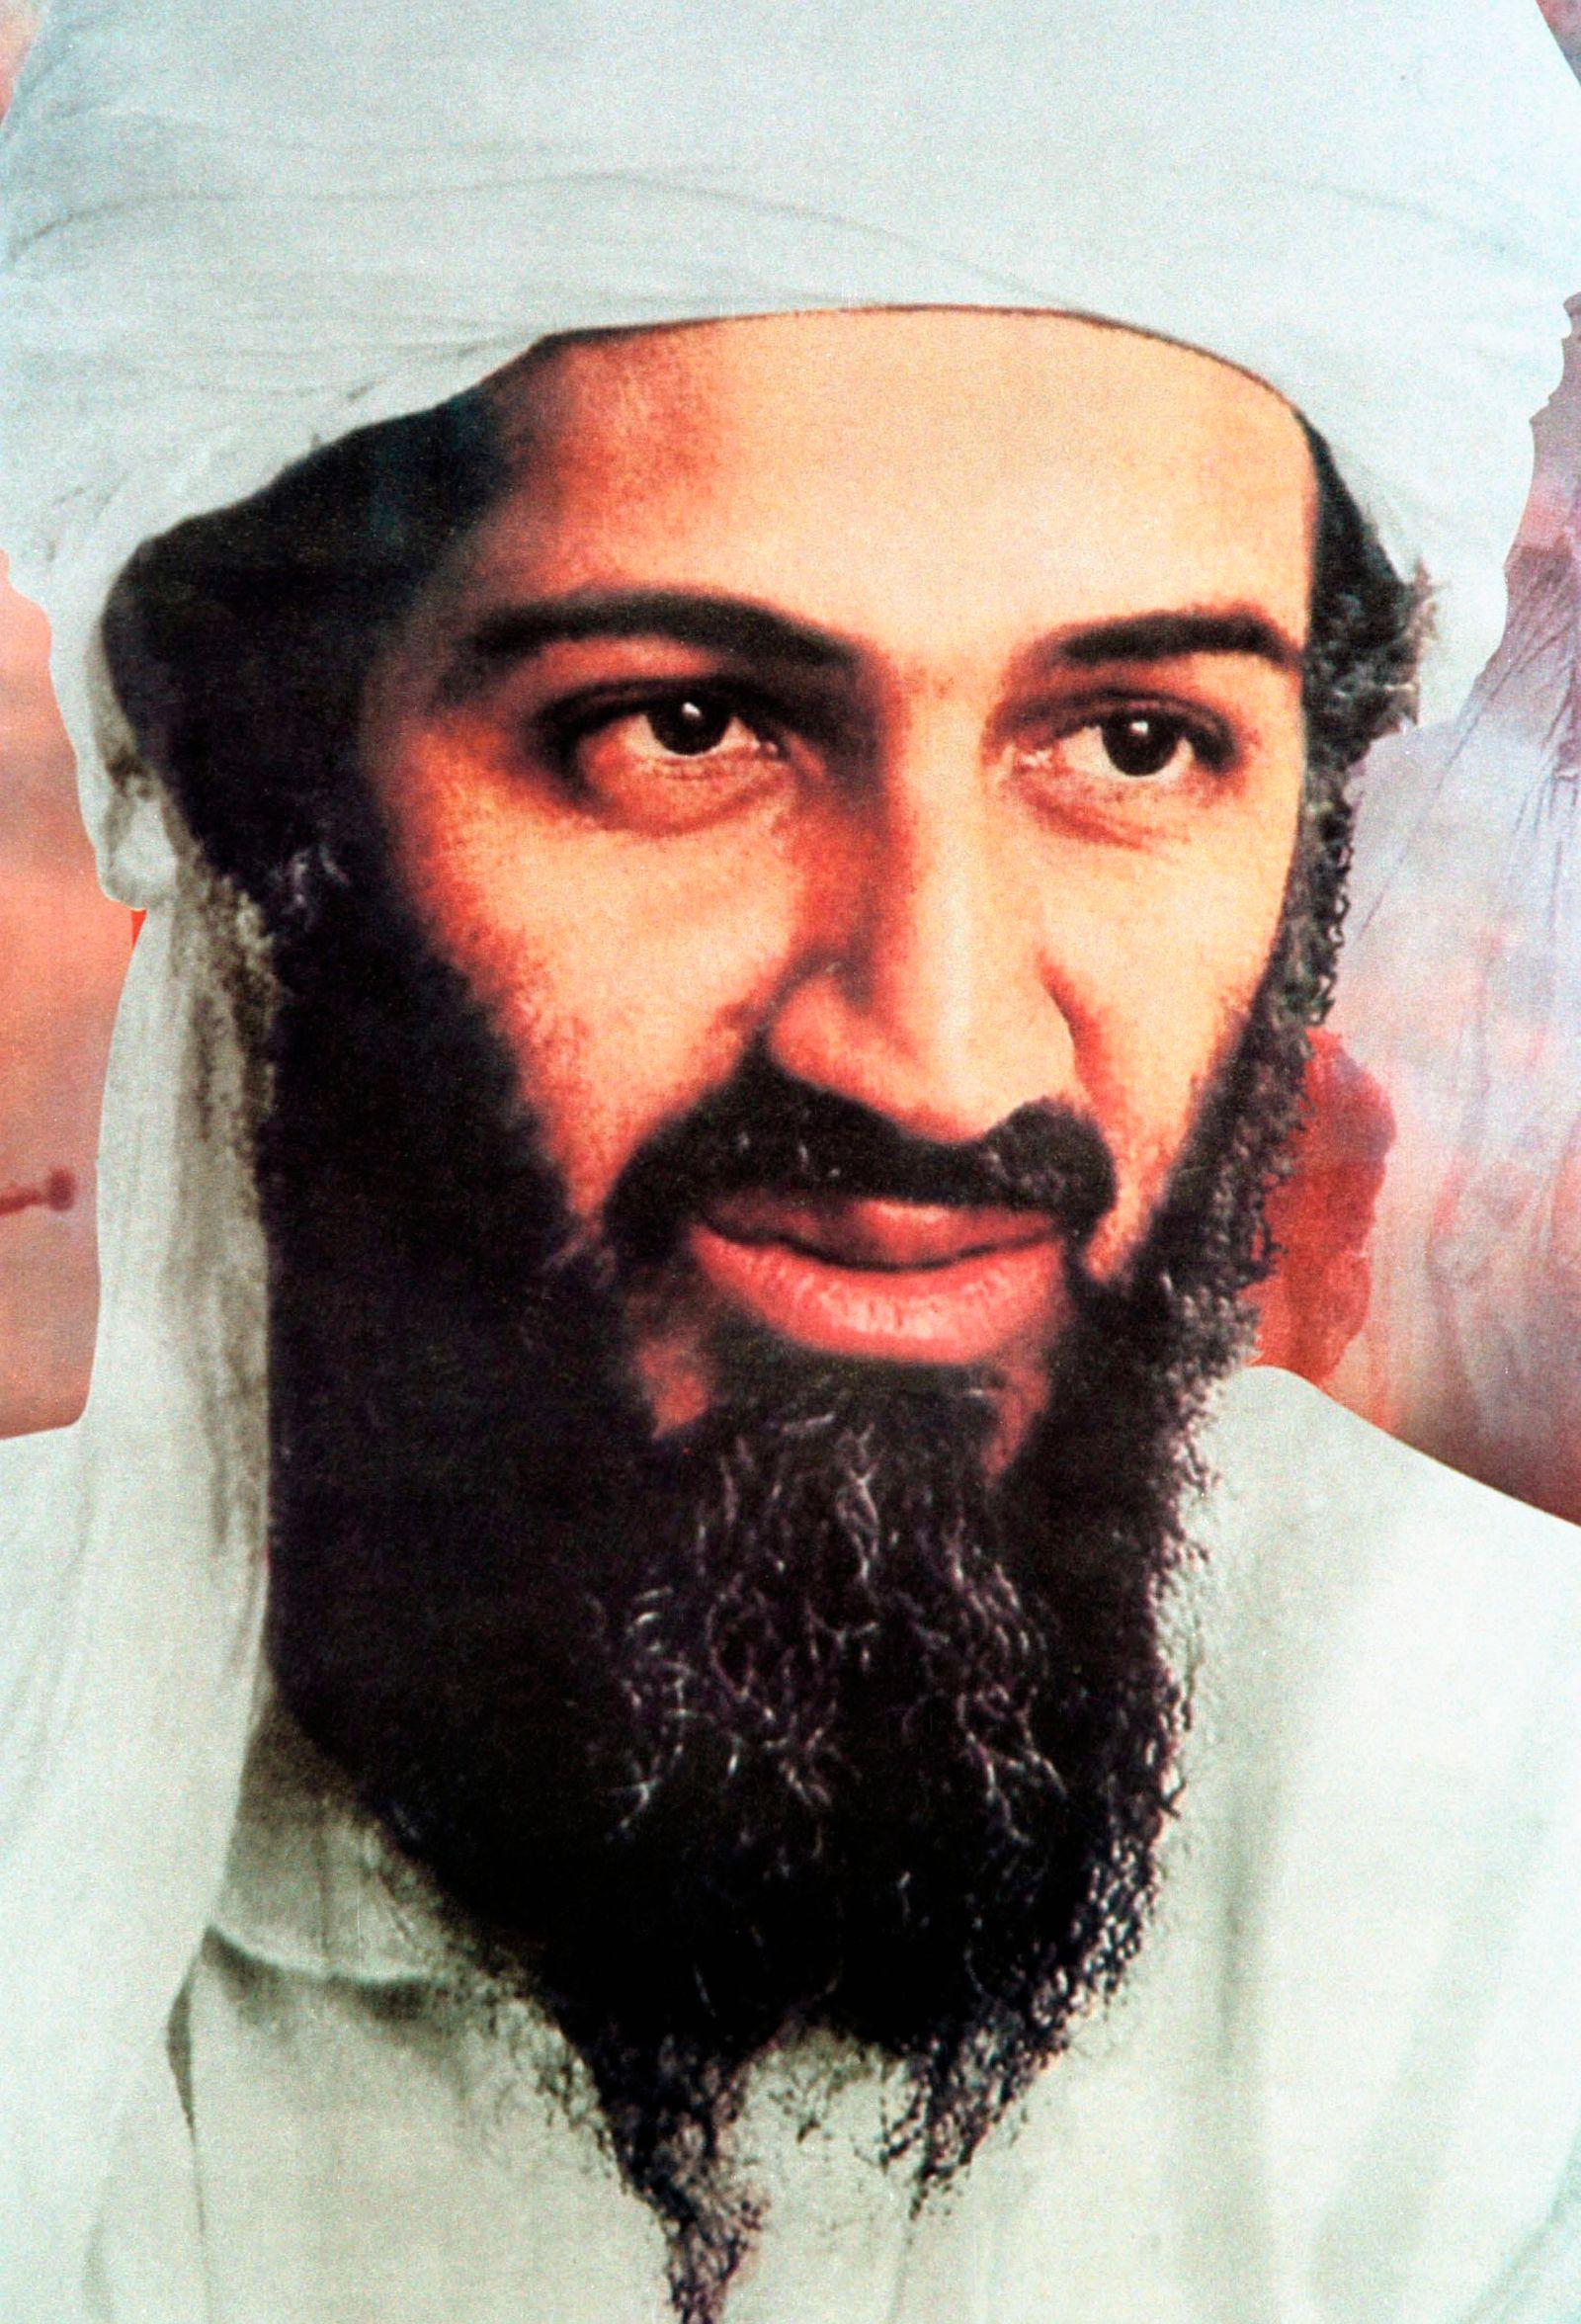 Portraits d'Oussama Ben Laden